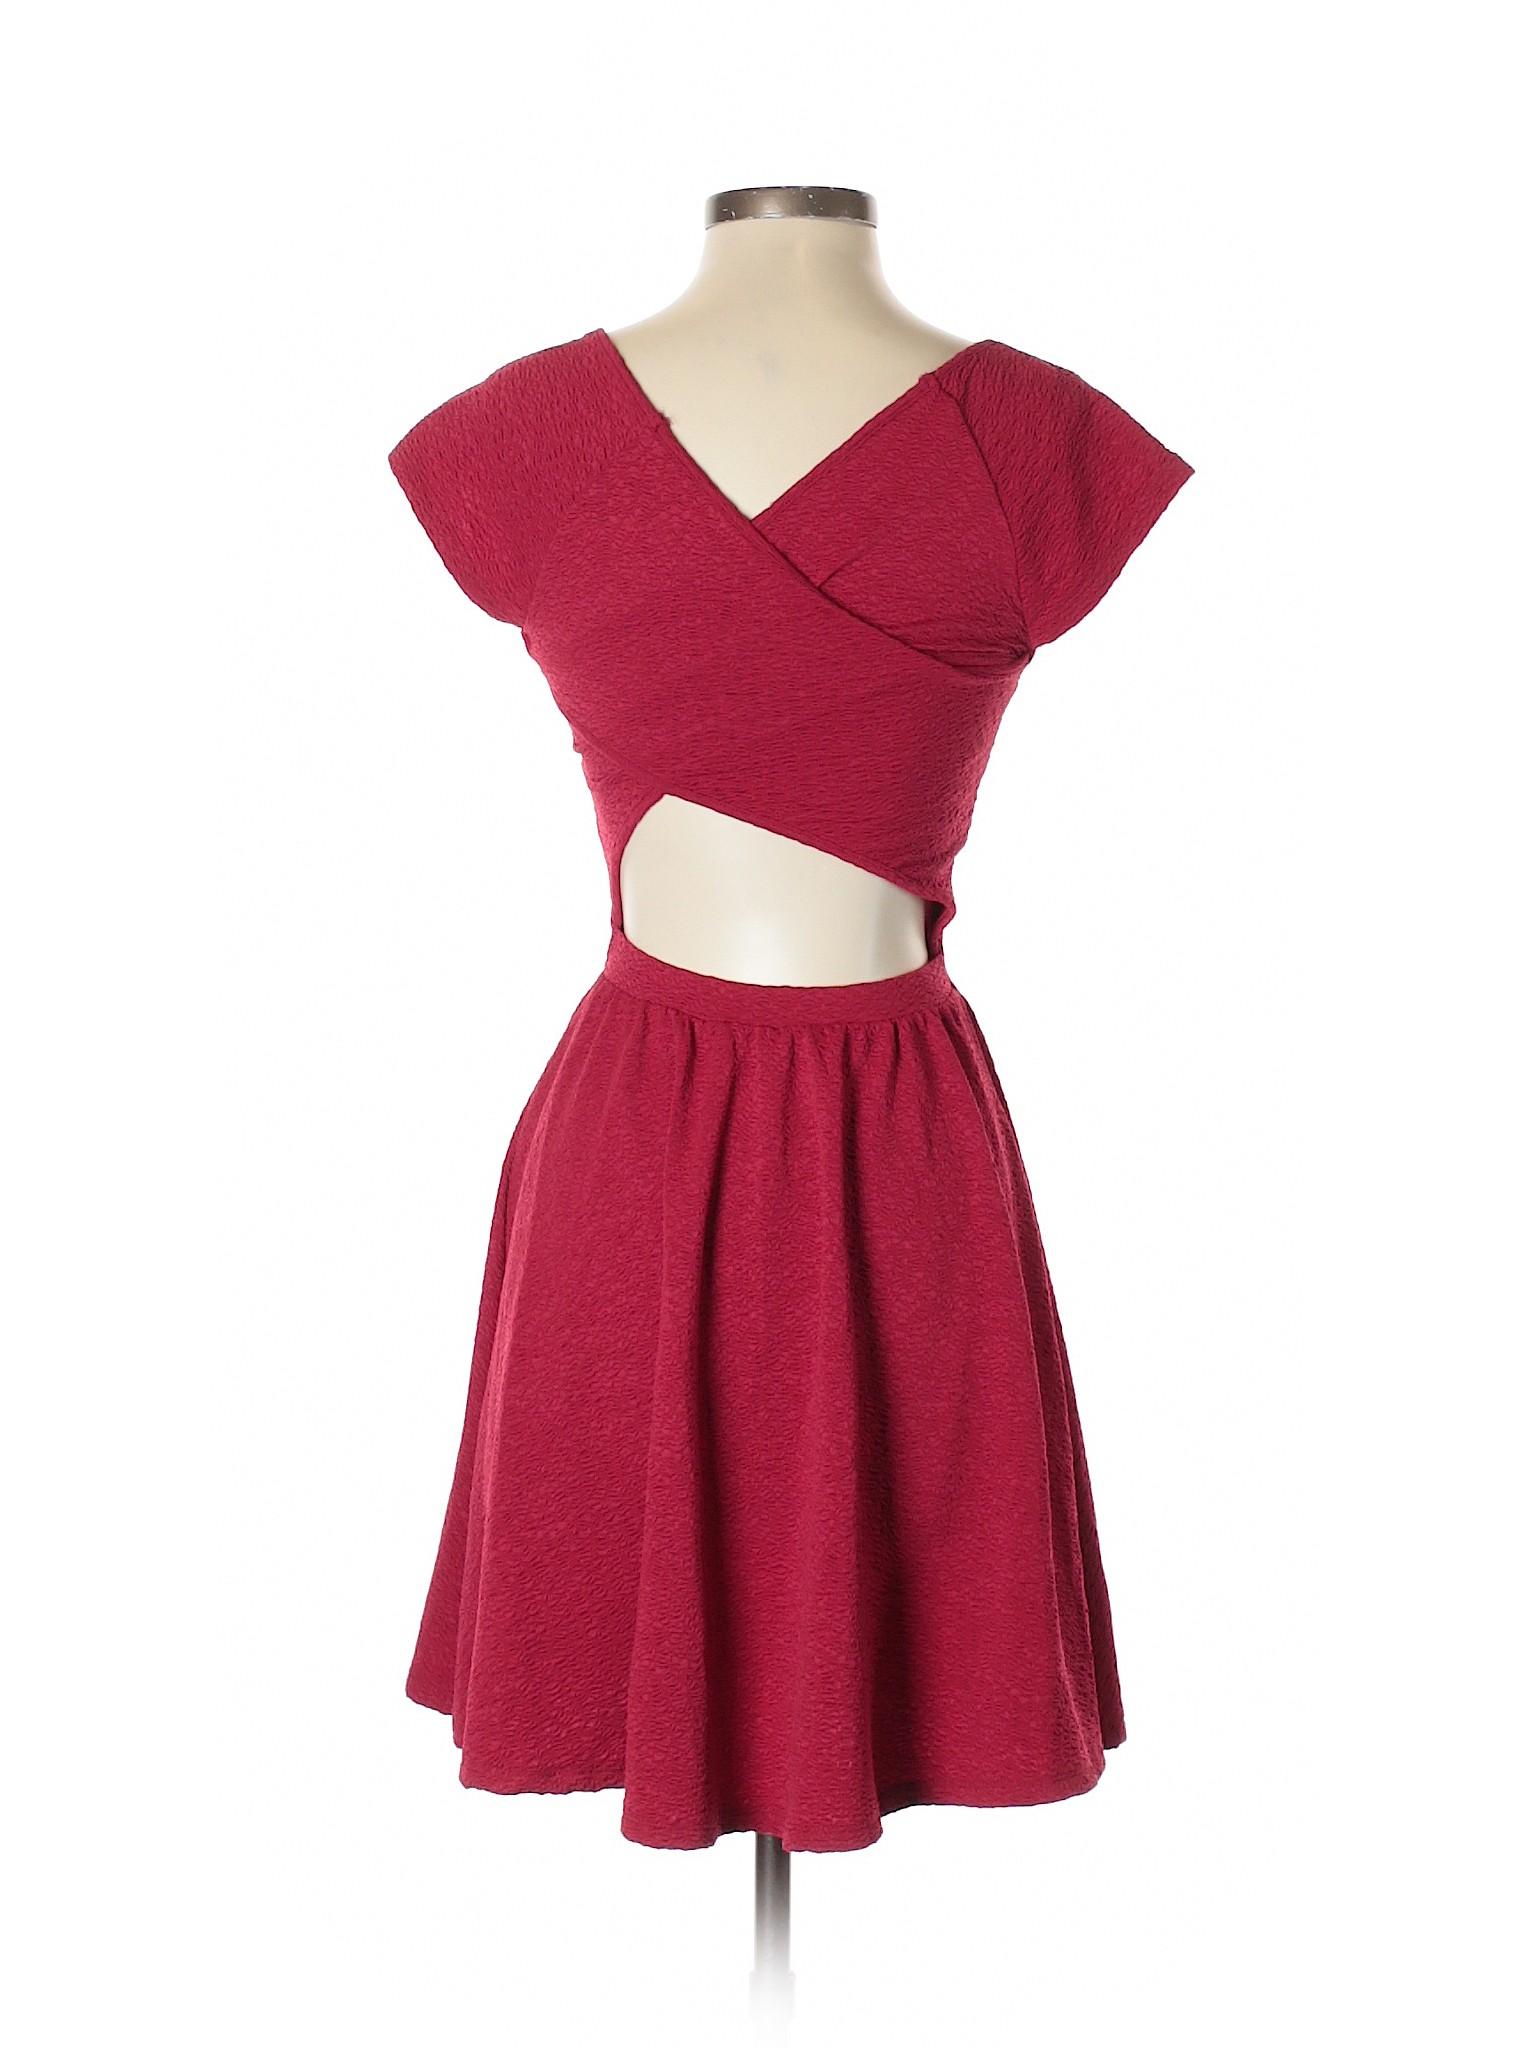 Fade Boutique amp; Casual Sparkle Dress winter xnvxf